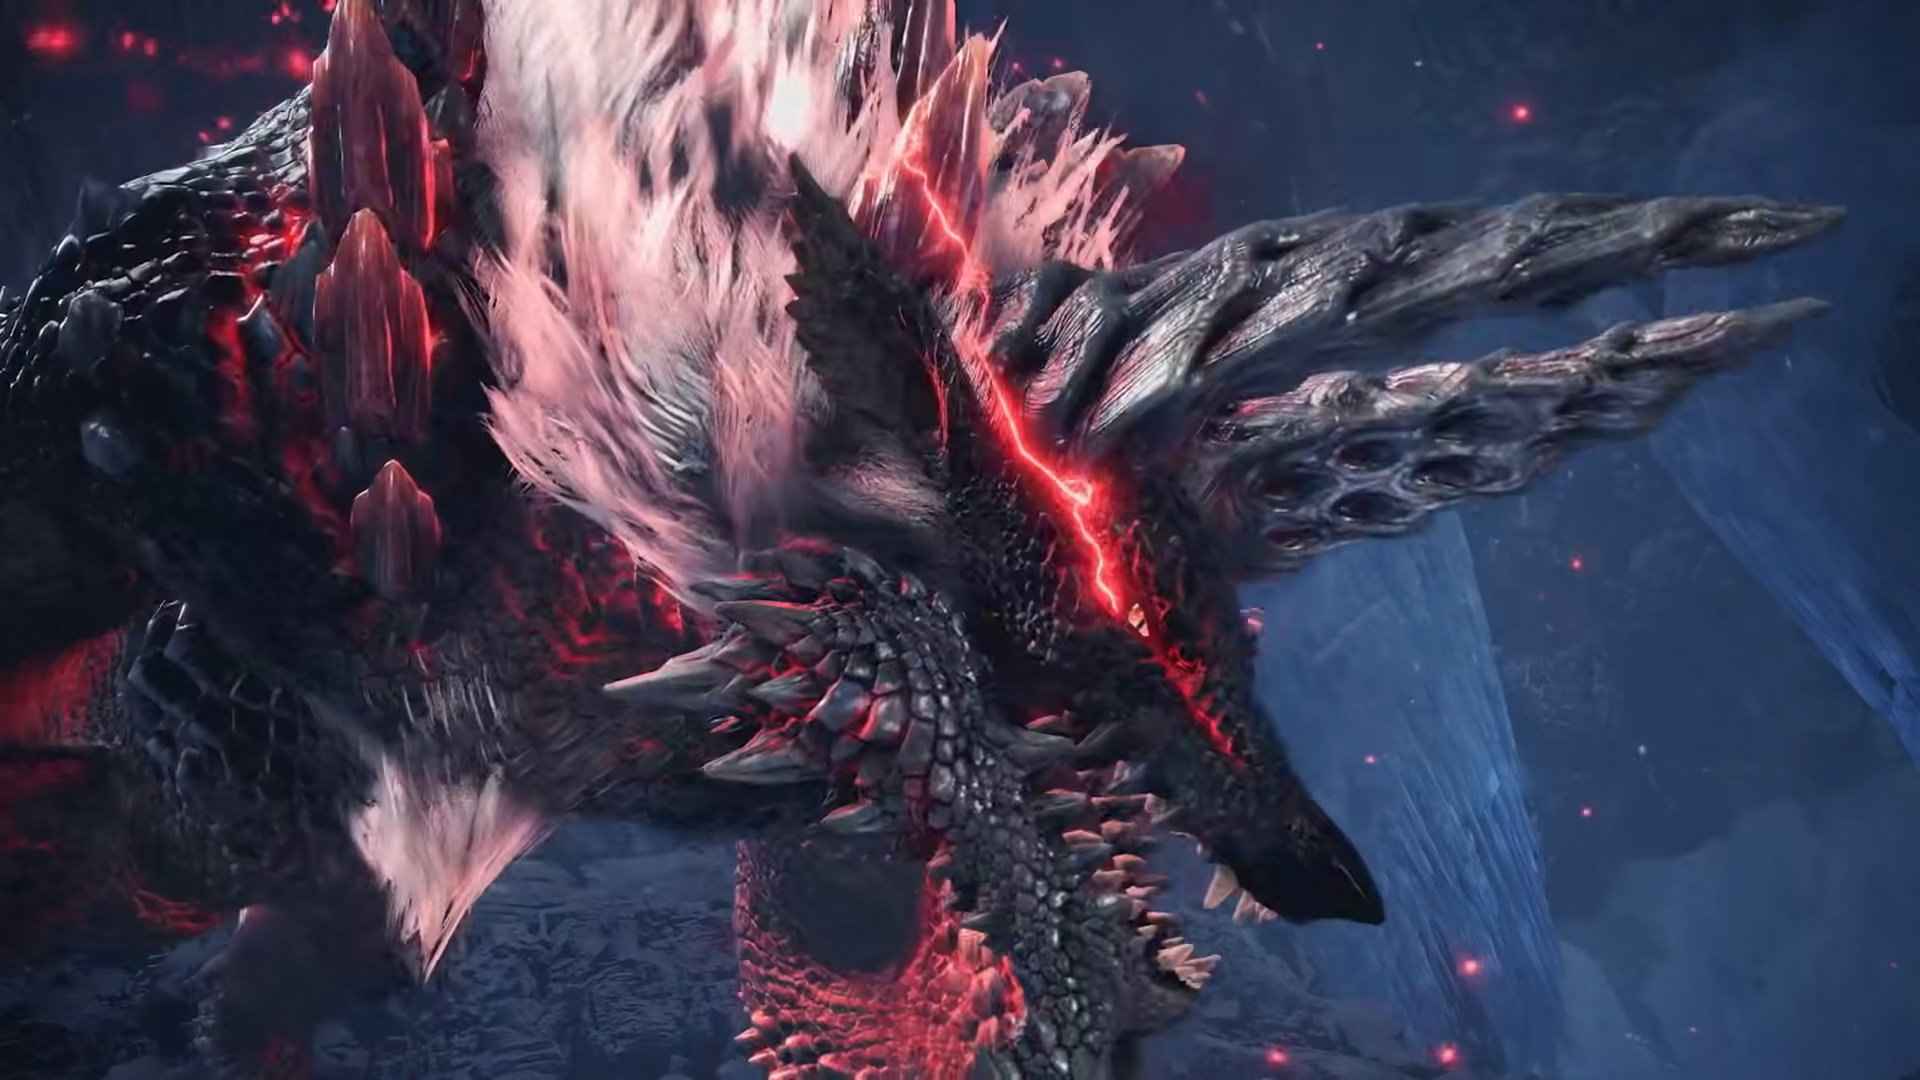 Stygian Zinogre is coming to Monster Hunter World: Iceborne PC on March 12, 2020.